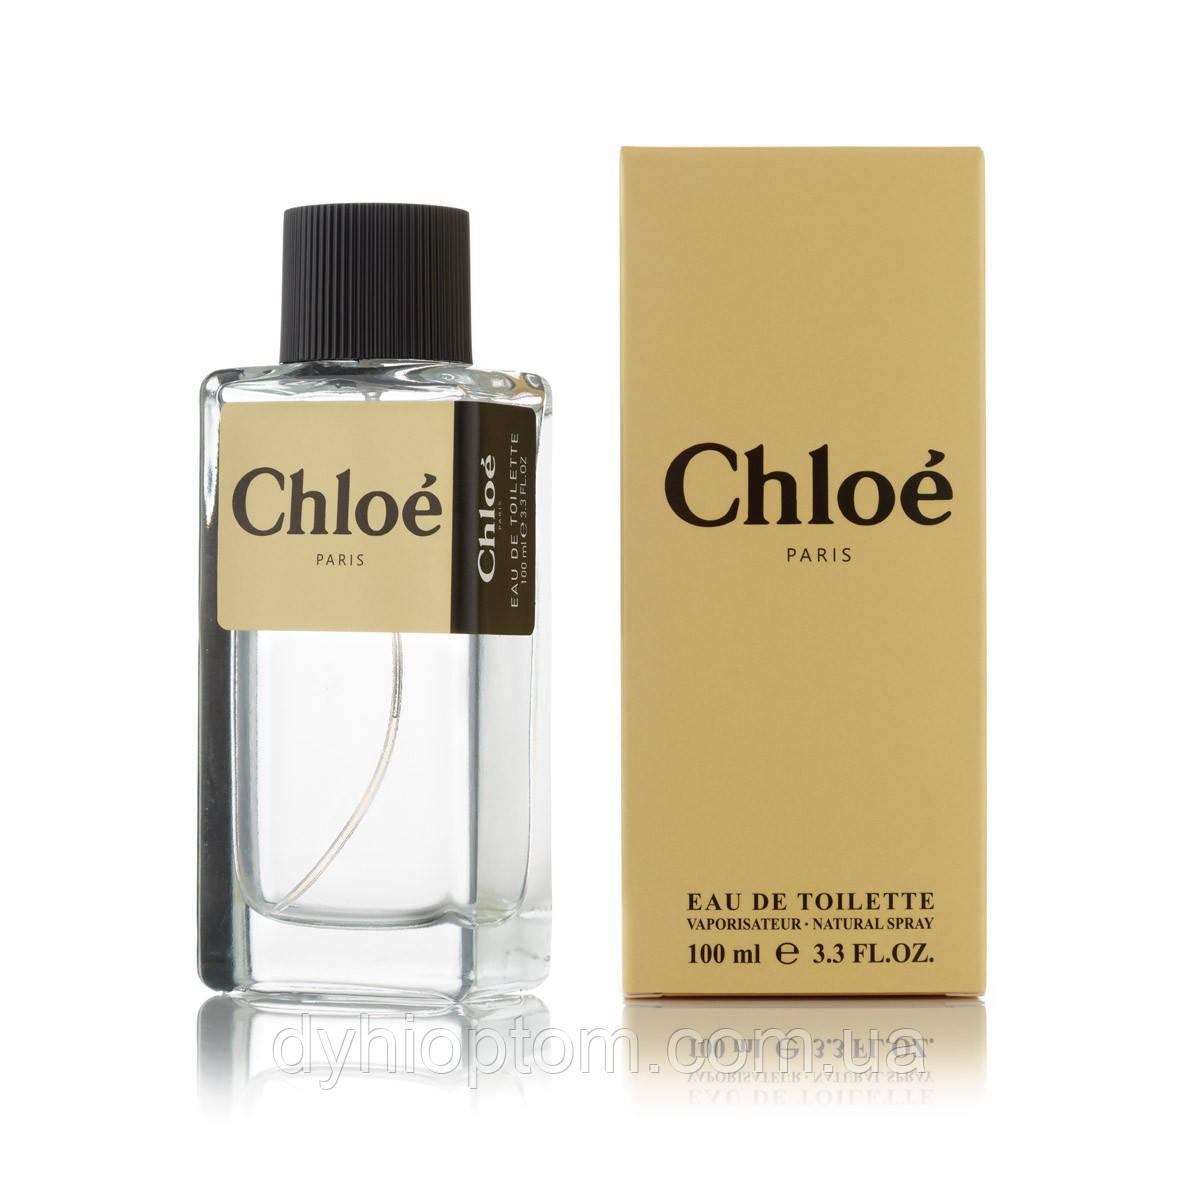 Жіноча туалетна вода 100ml Chloe